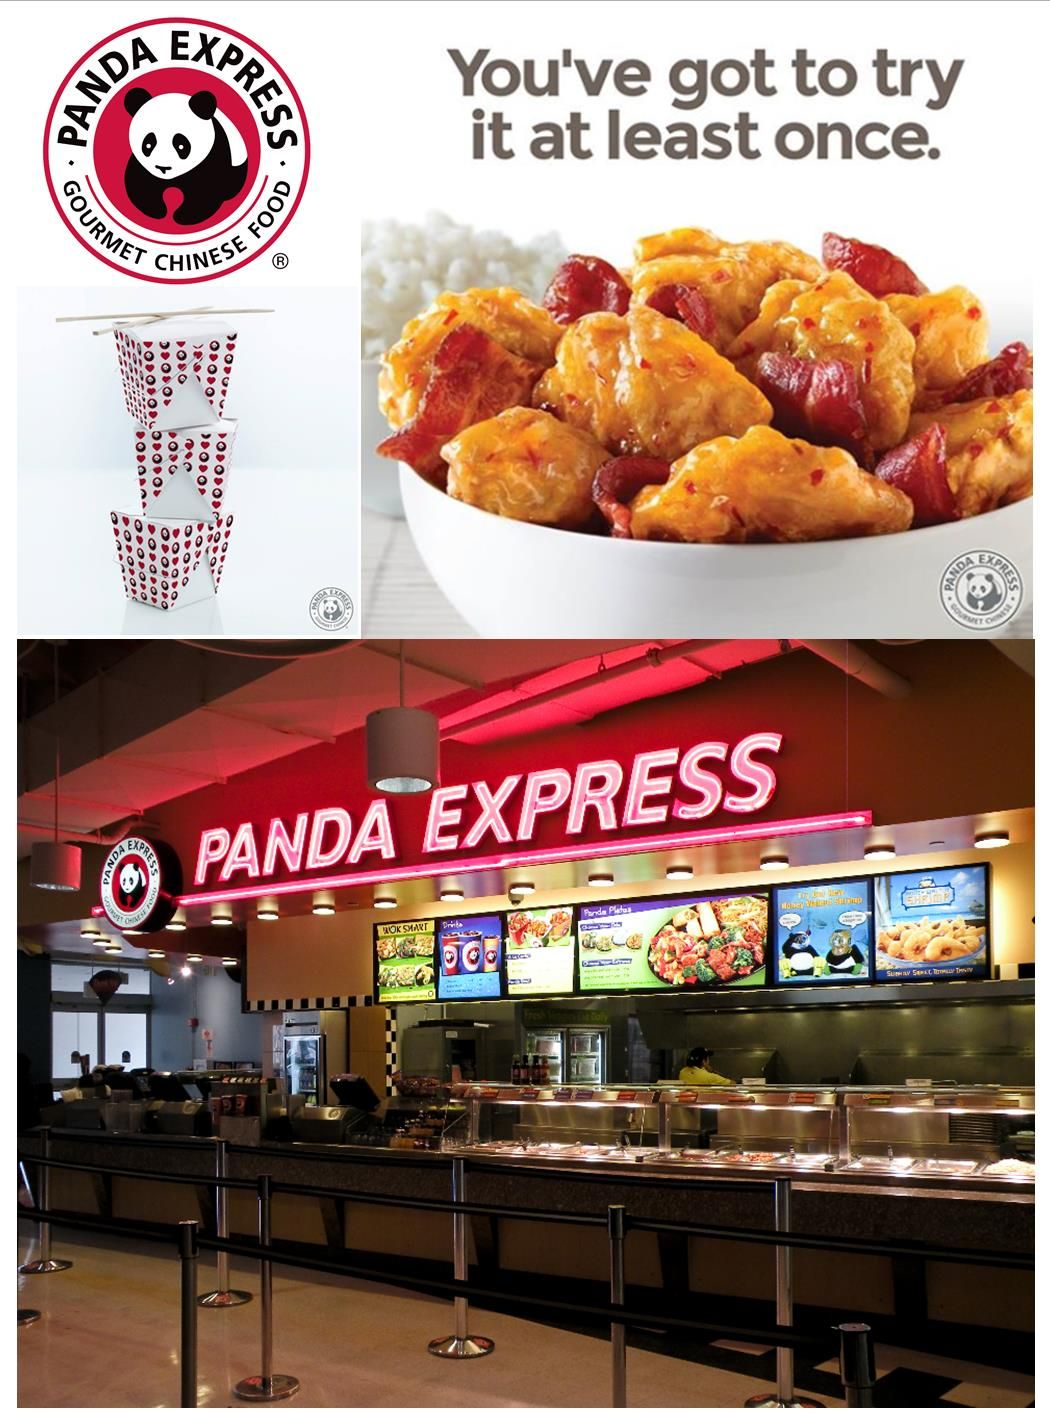 is panda express a franchise